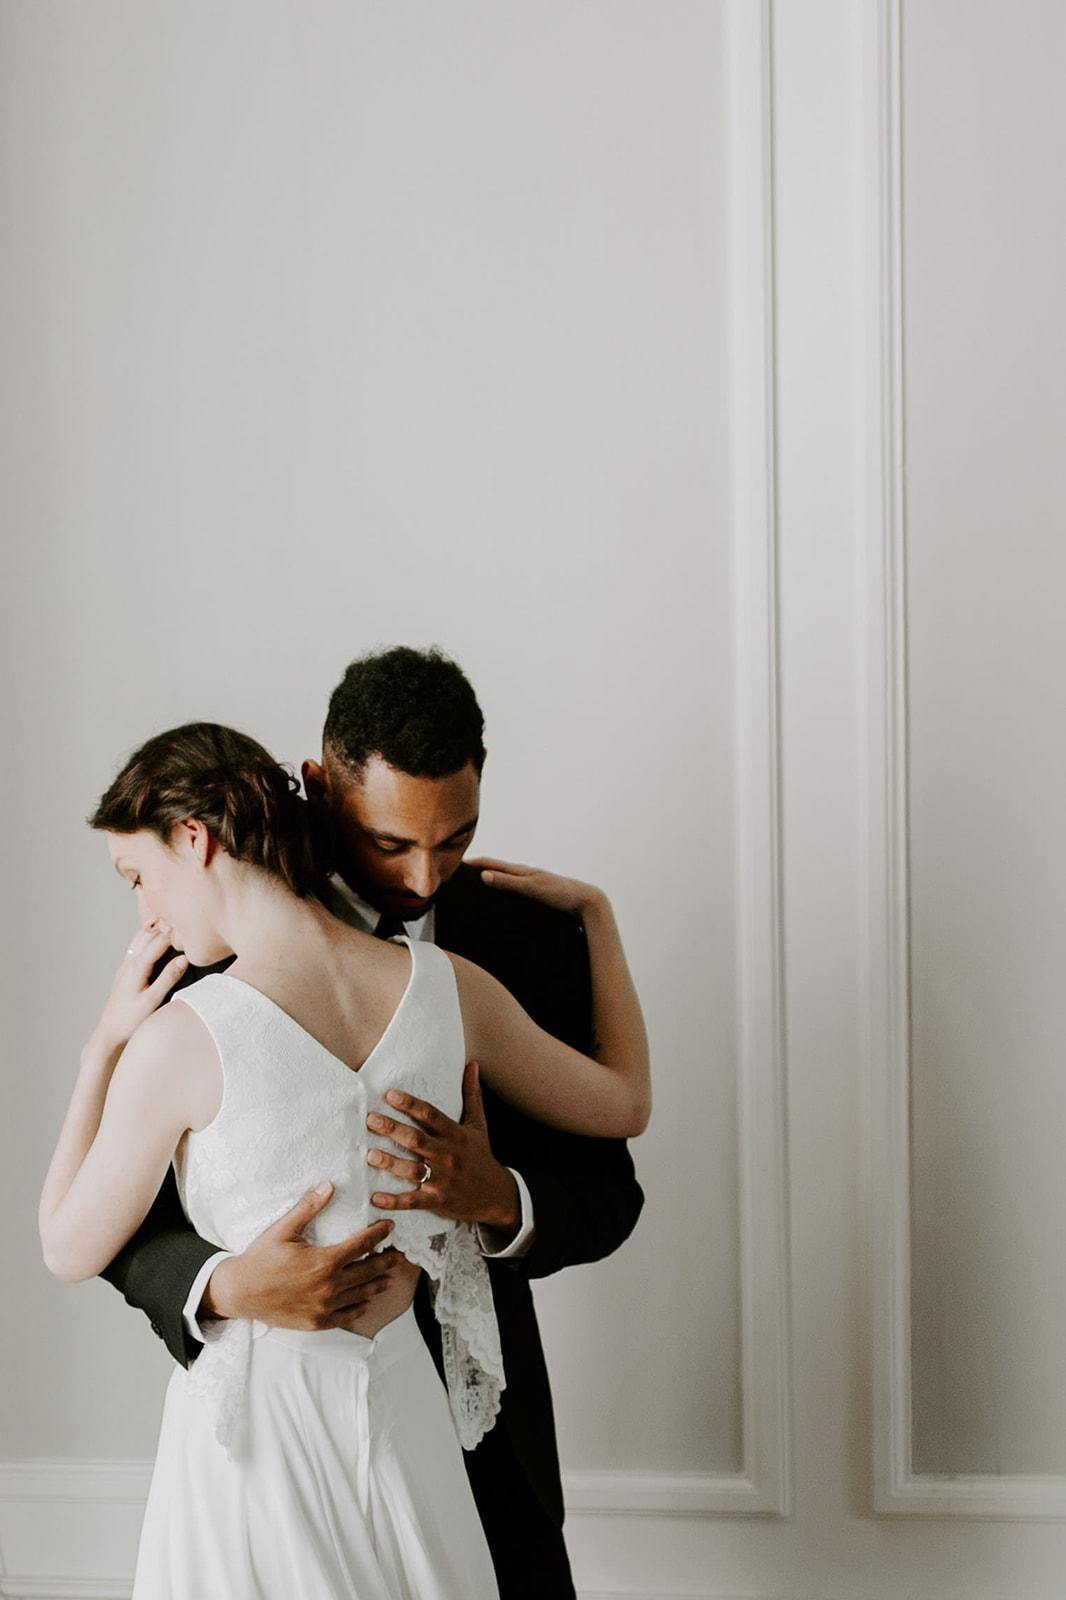 photo de mariage maries amour tendresse